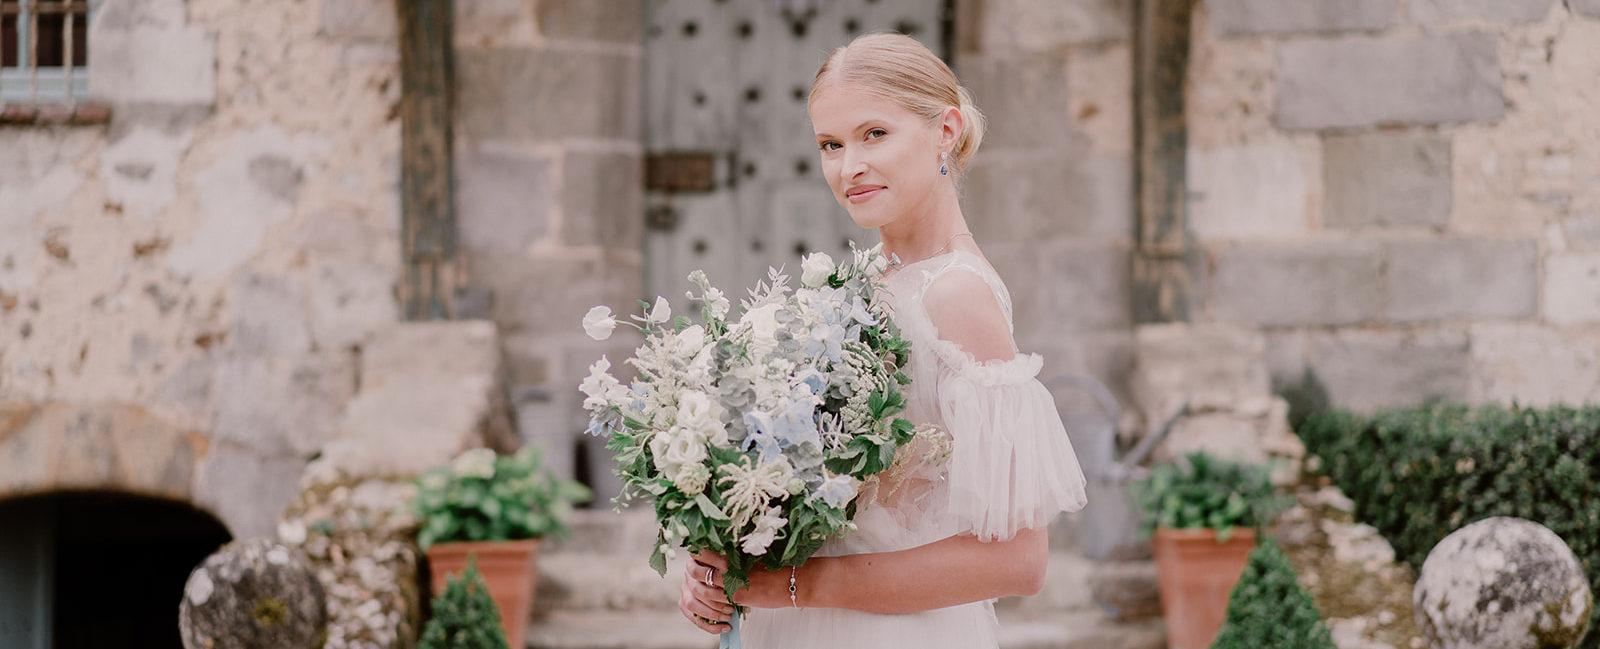 Shooting Inspiration - An enchanted secret garden wedding - Ma déco aux petits oignons